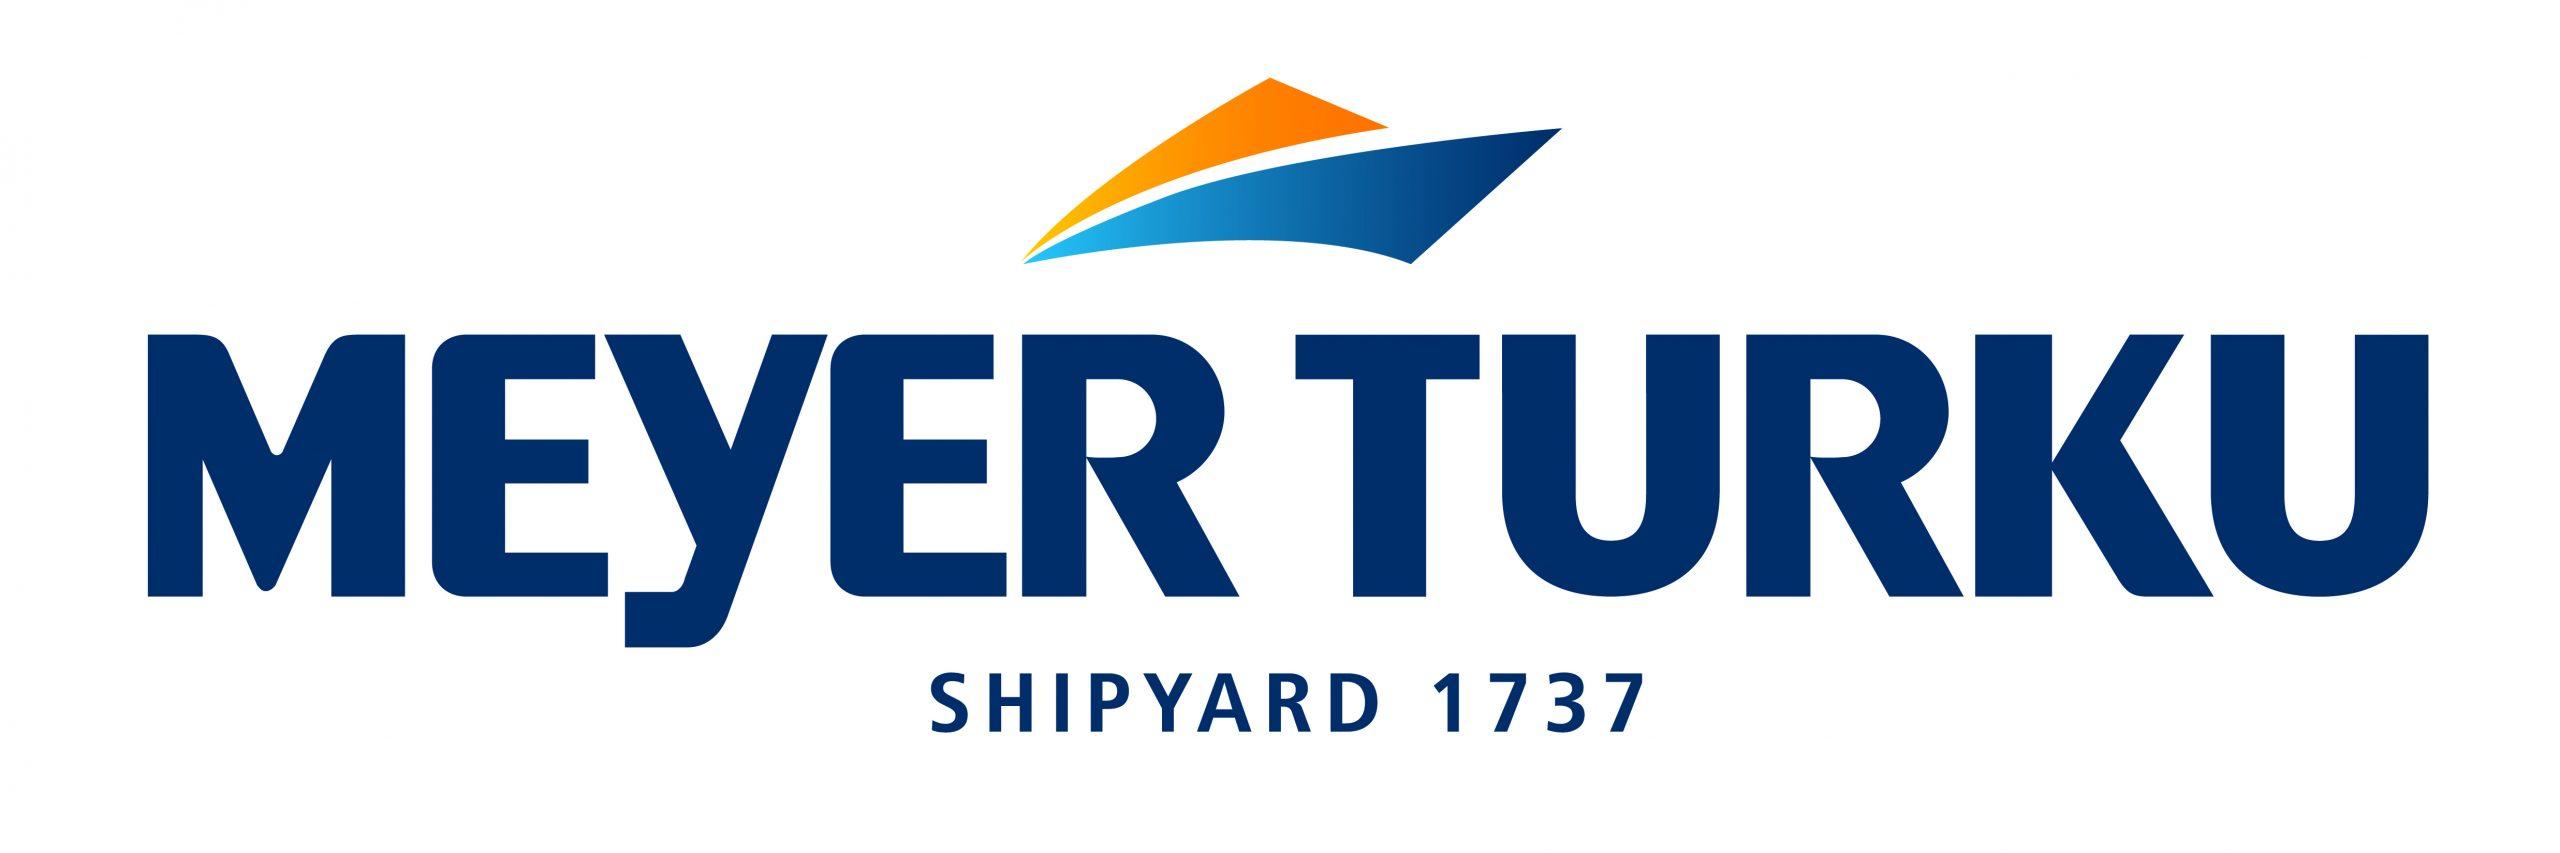 logo_meyerturku_print (1)